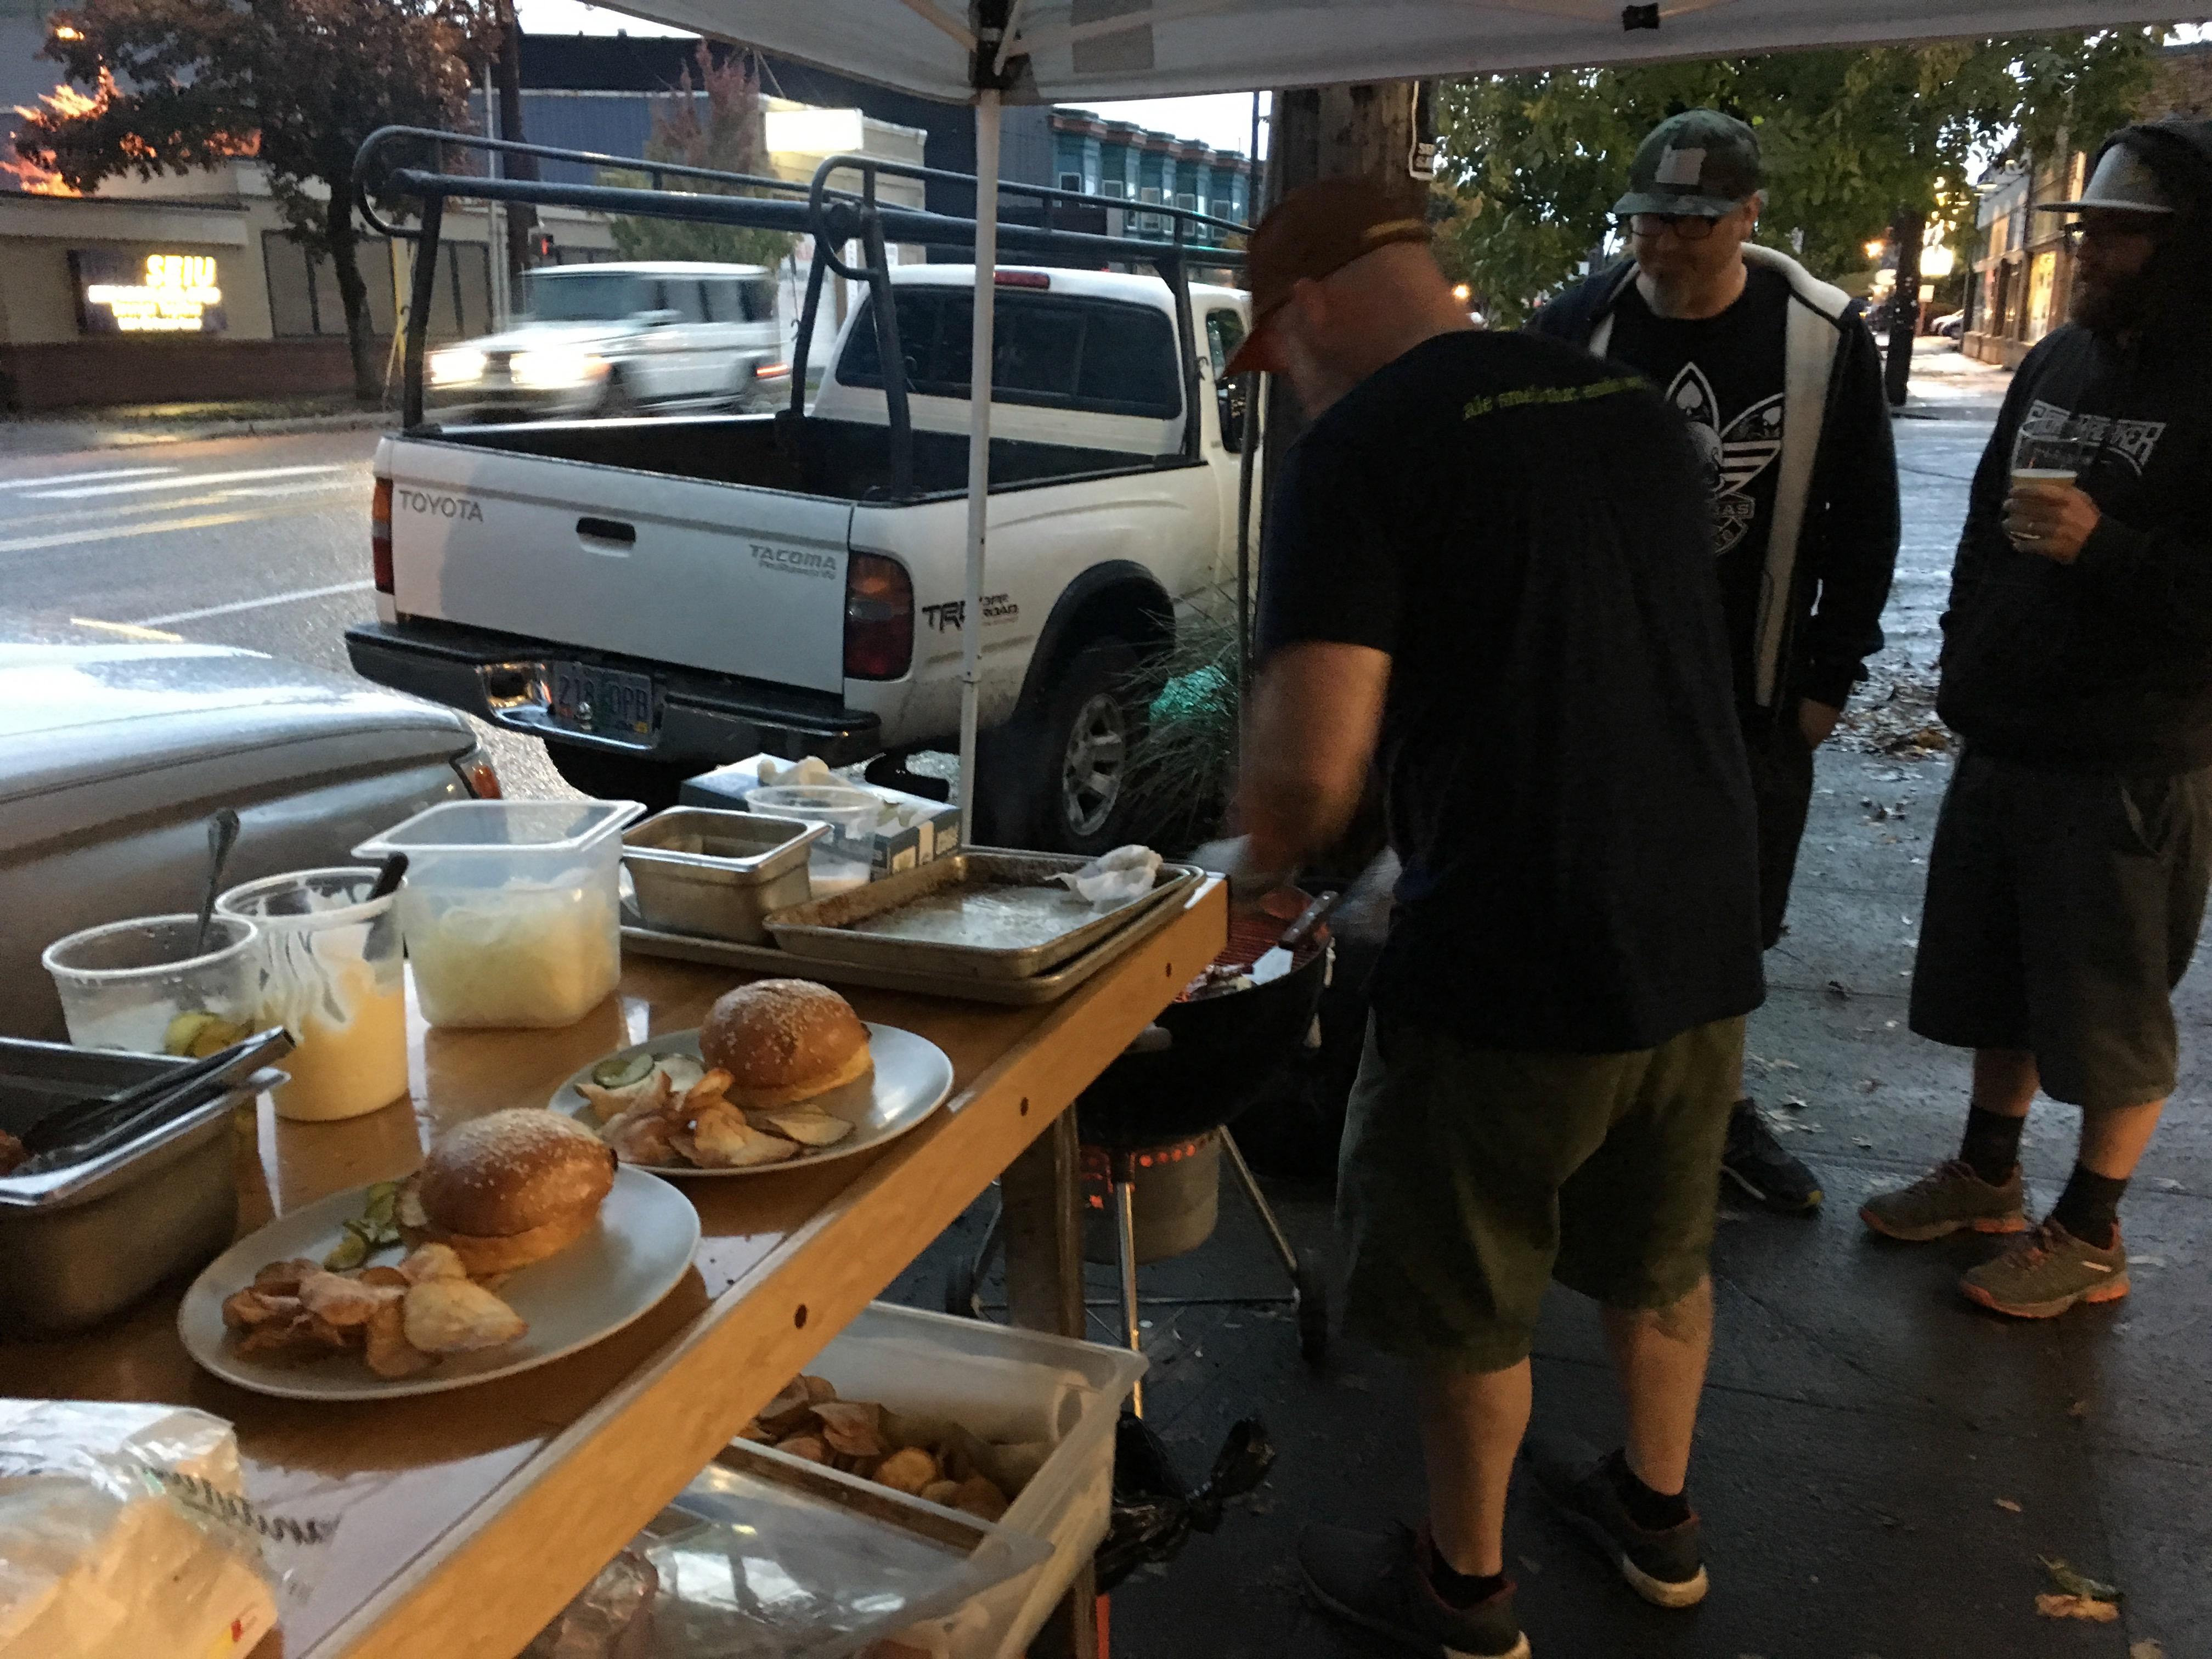 Jackson Wyatt prepares his sous vide burgers at N.W.I.P.A.